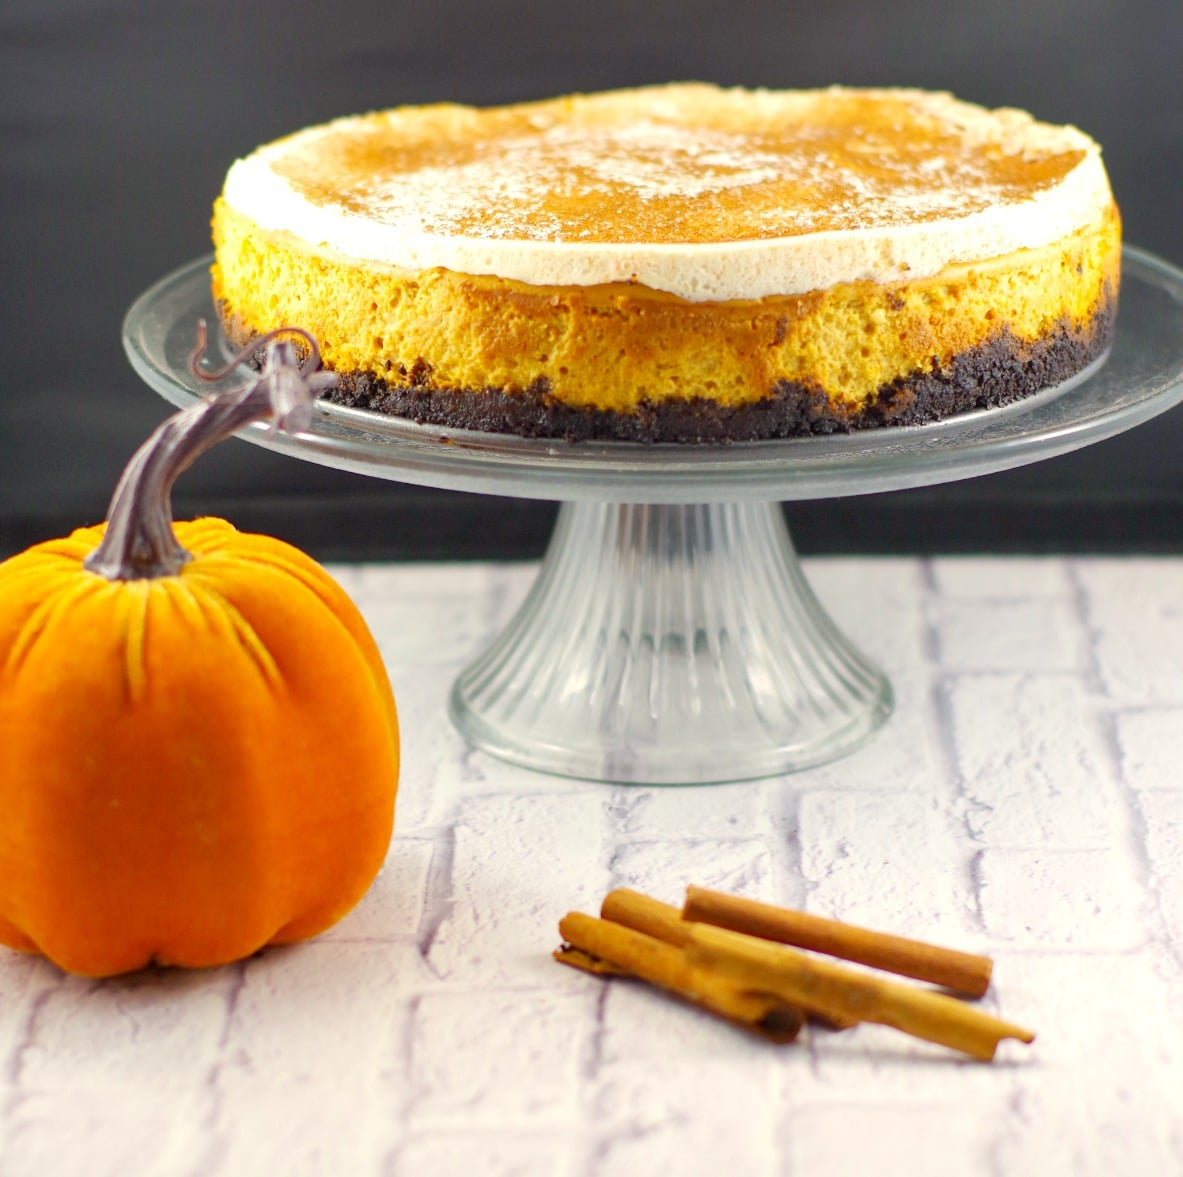 Skinny Pumpkin Cheesecake Recipe | #Thanksgivingdessert, #pumpkin cheesecake - Foodmeanderings.com